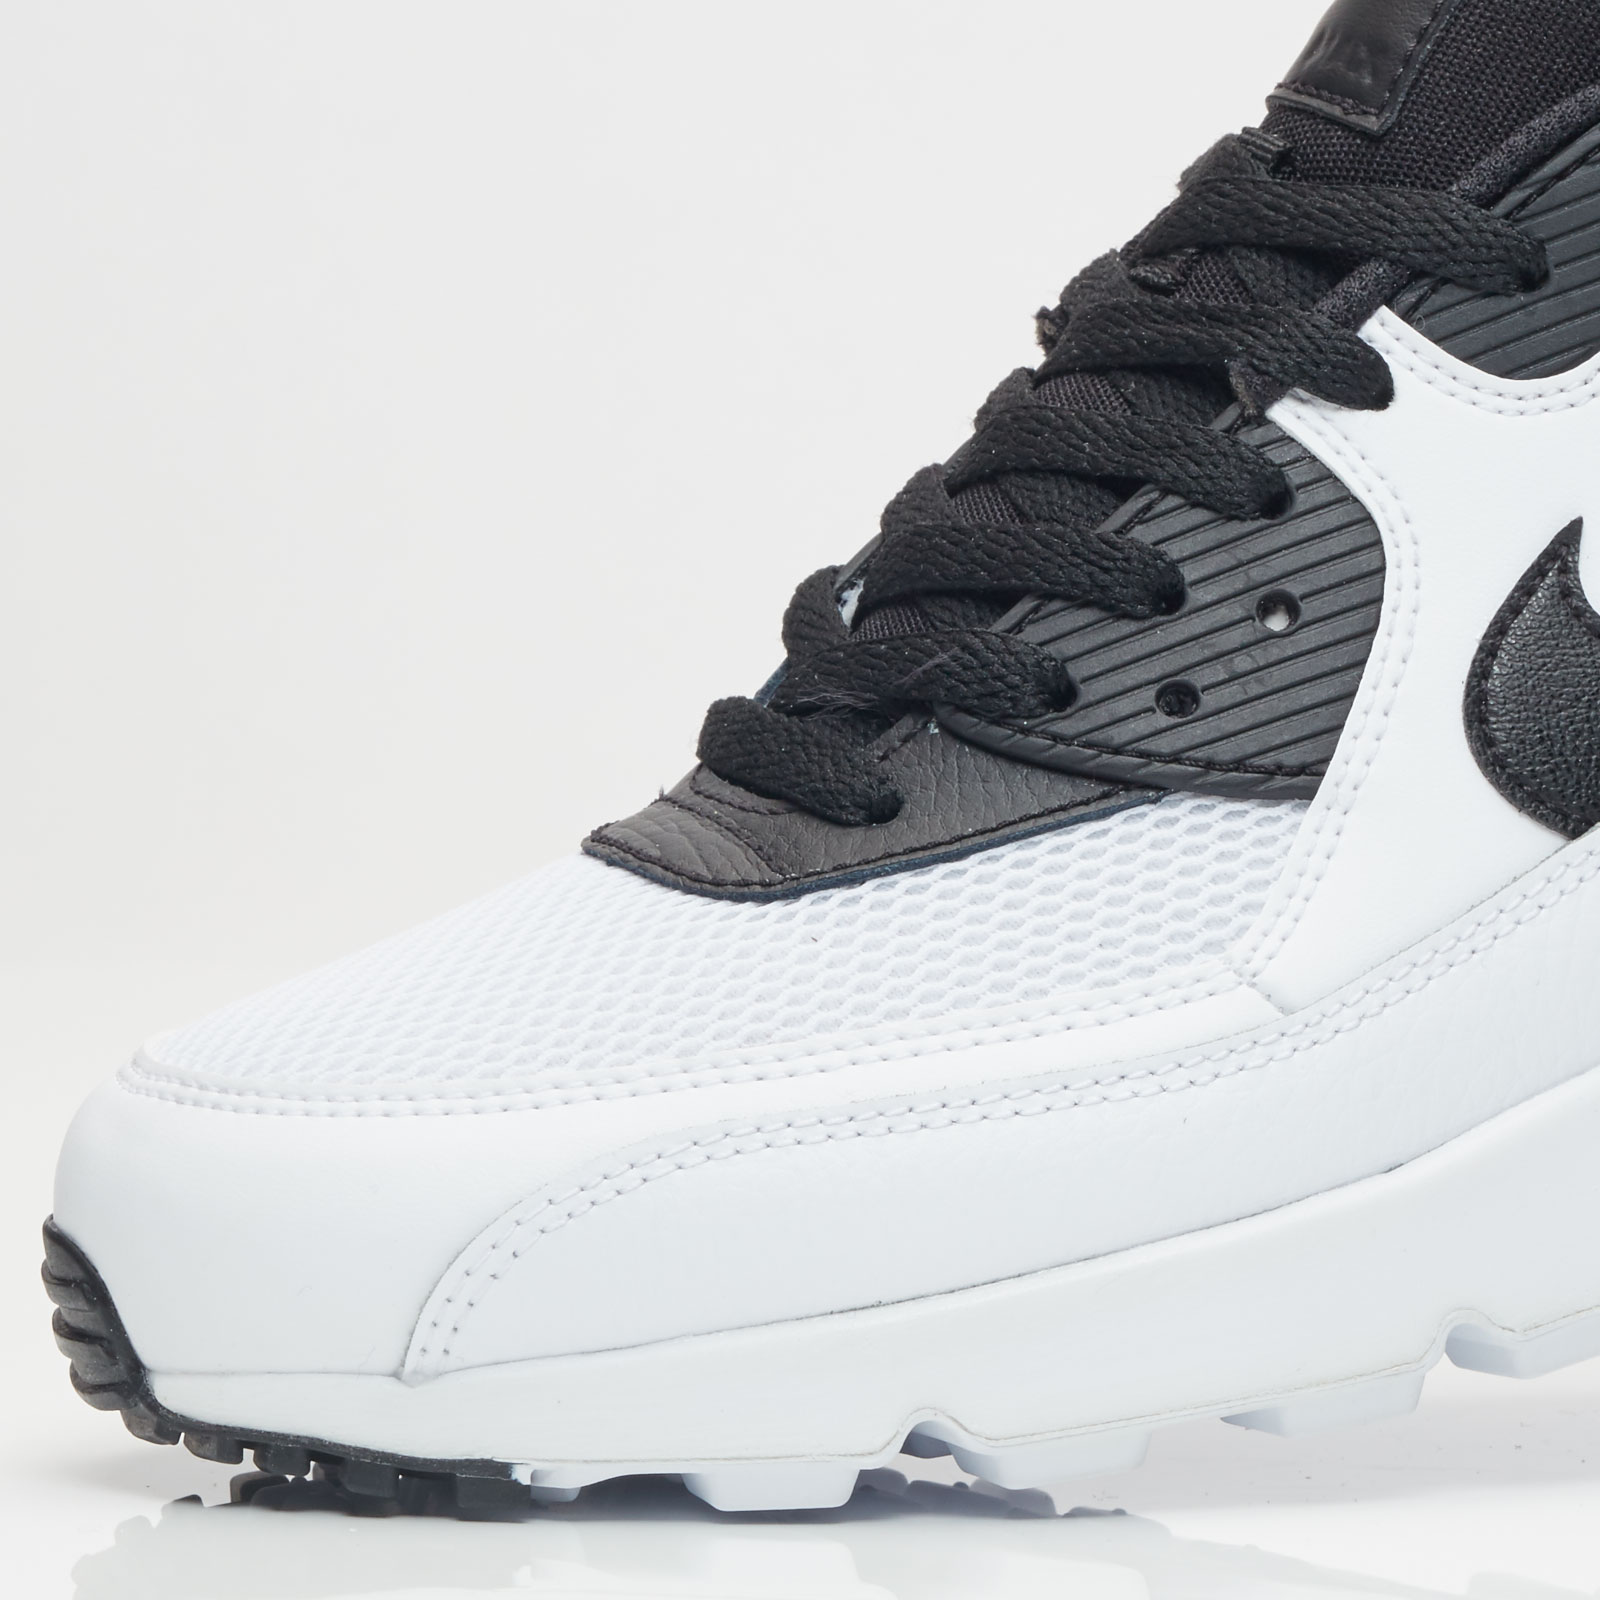 Buy Nike Air Max 90 Essential 131 537384 131 Online | at